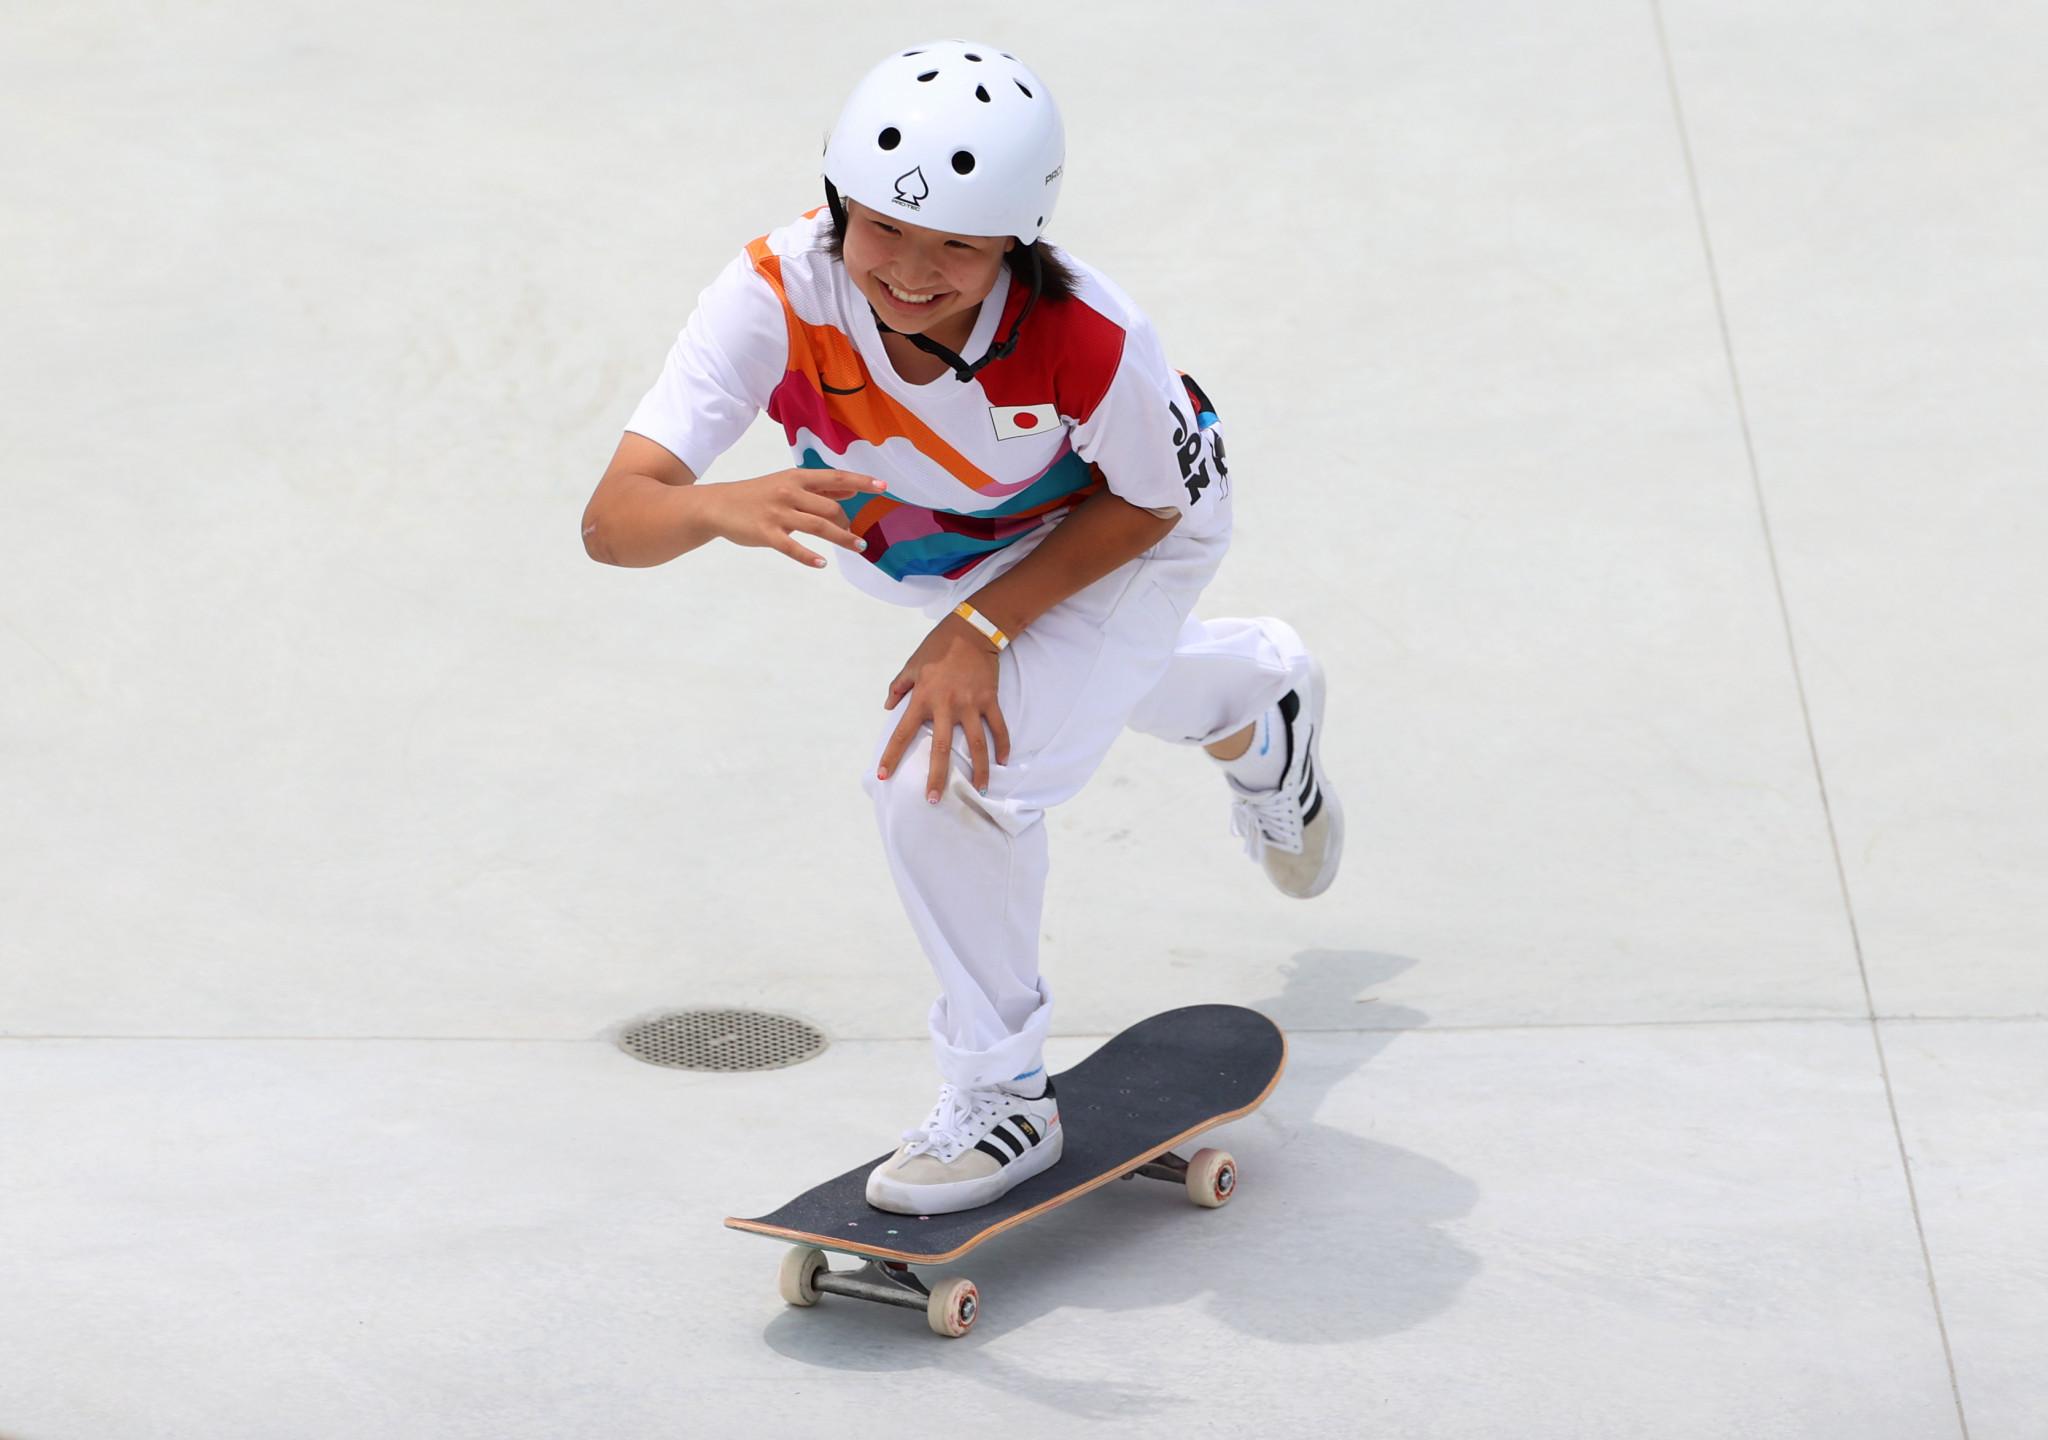 Olympic champion Nishiya among stars at SLS leg in Salt Lake City